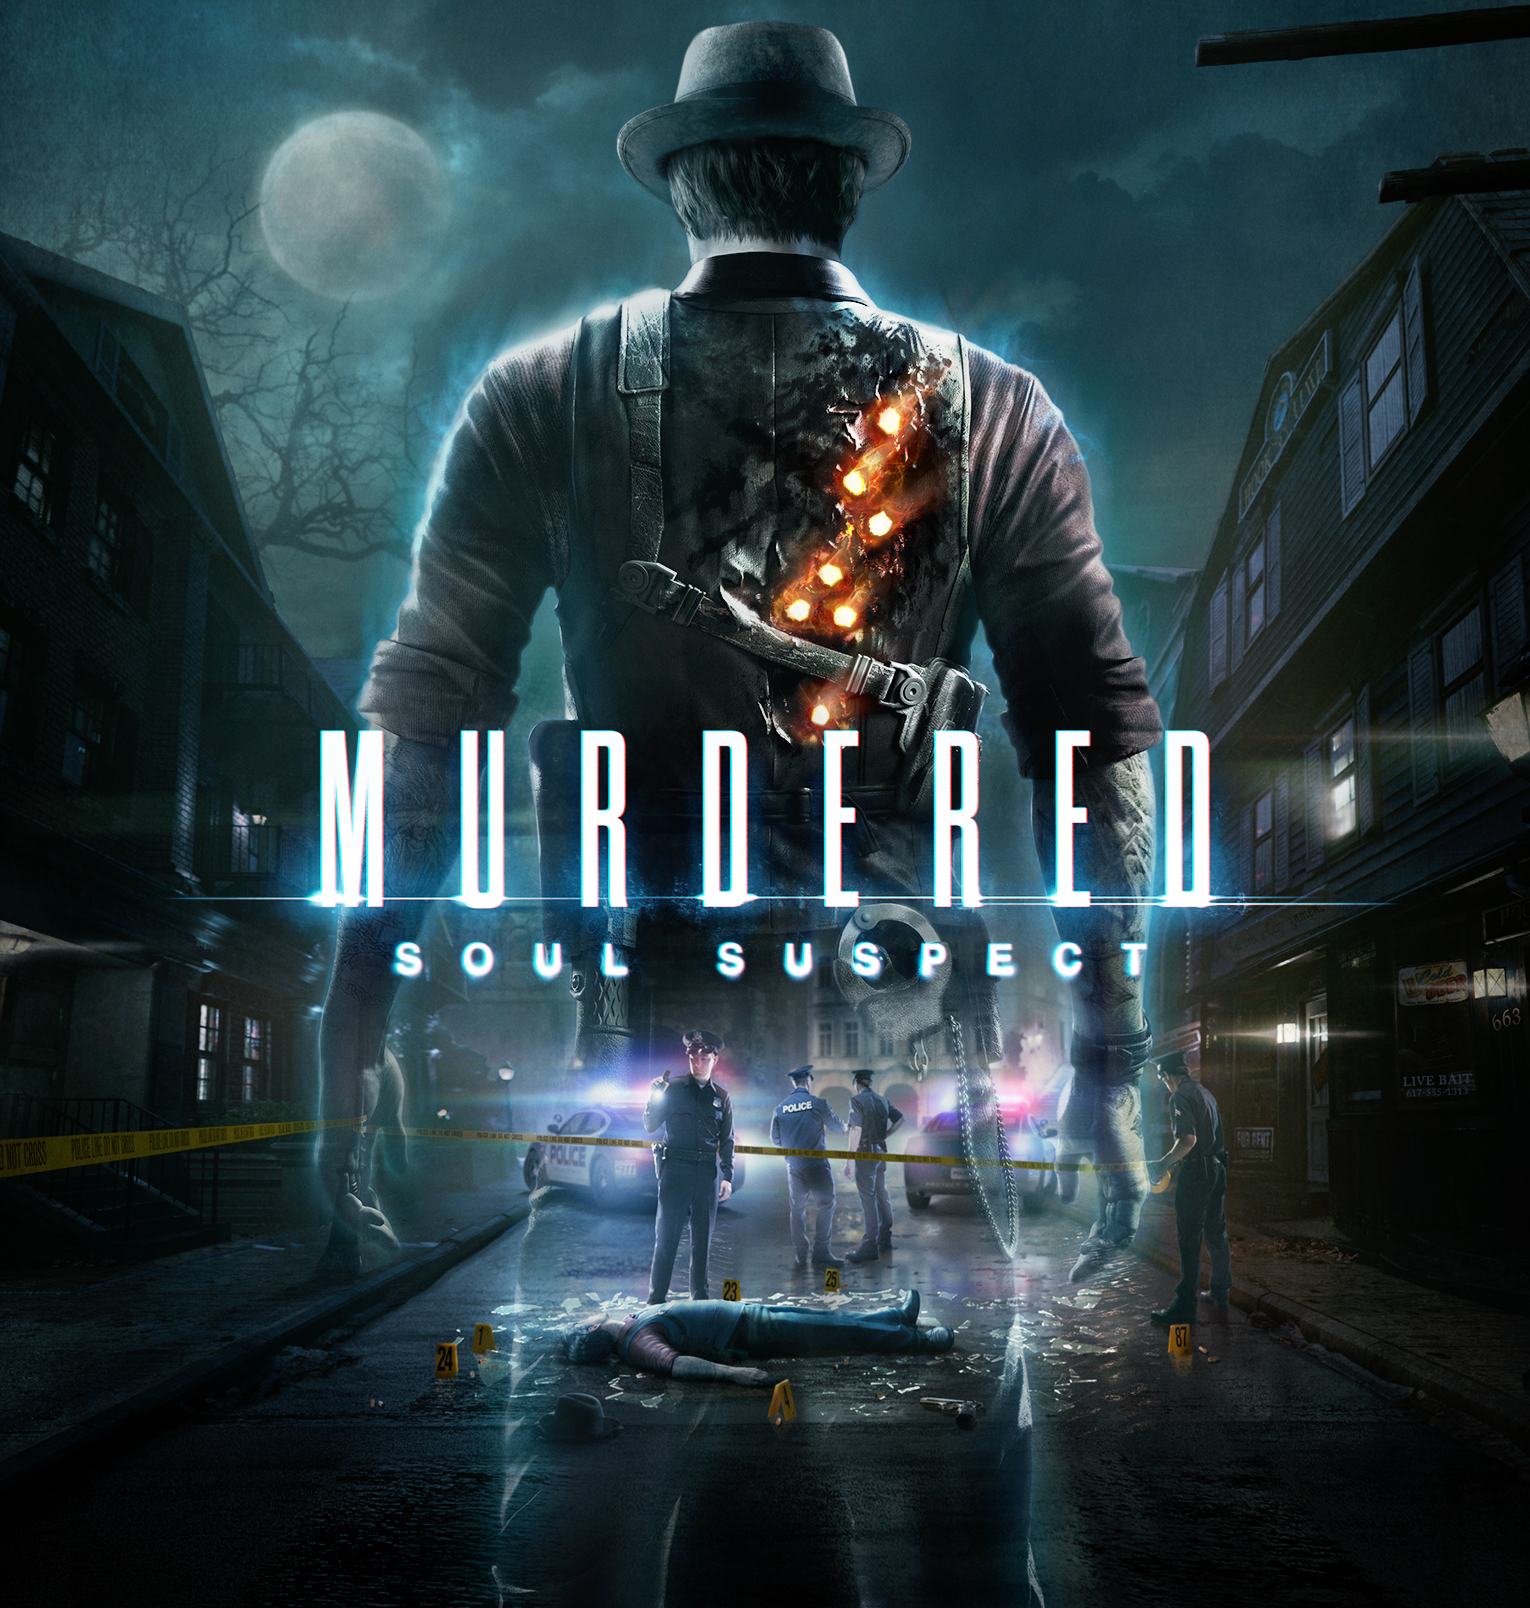 murdered-soul-suspect-key-art